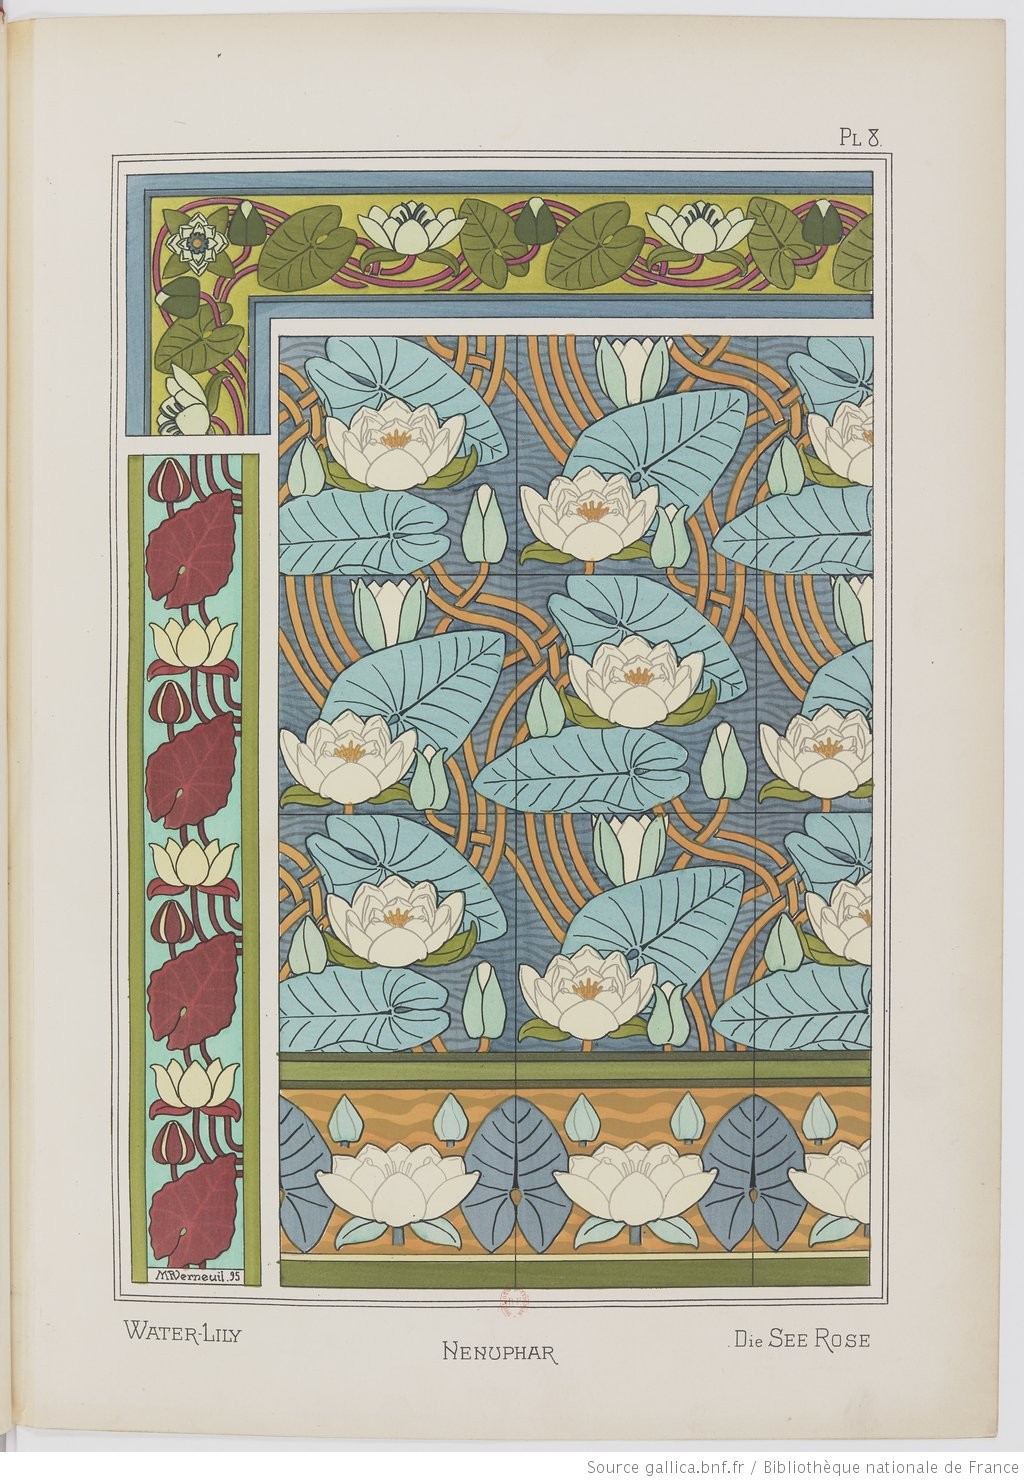 Waterlily. Image 19. Plate VIII.